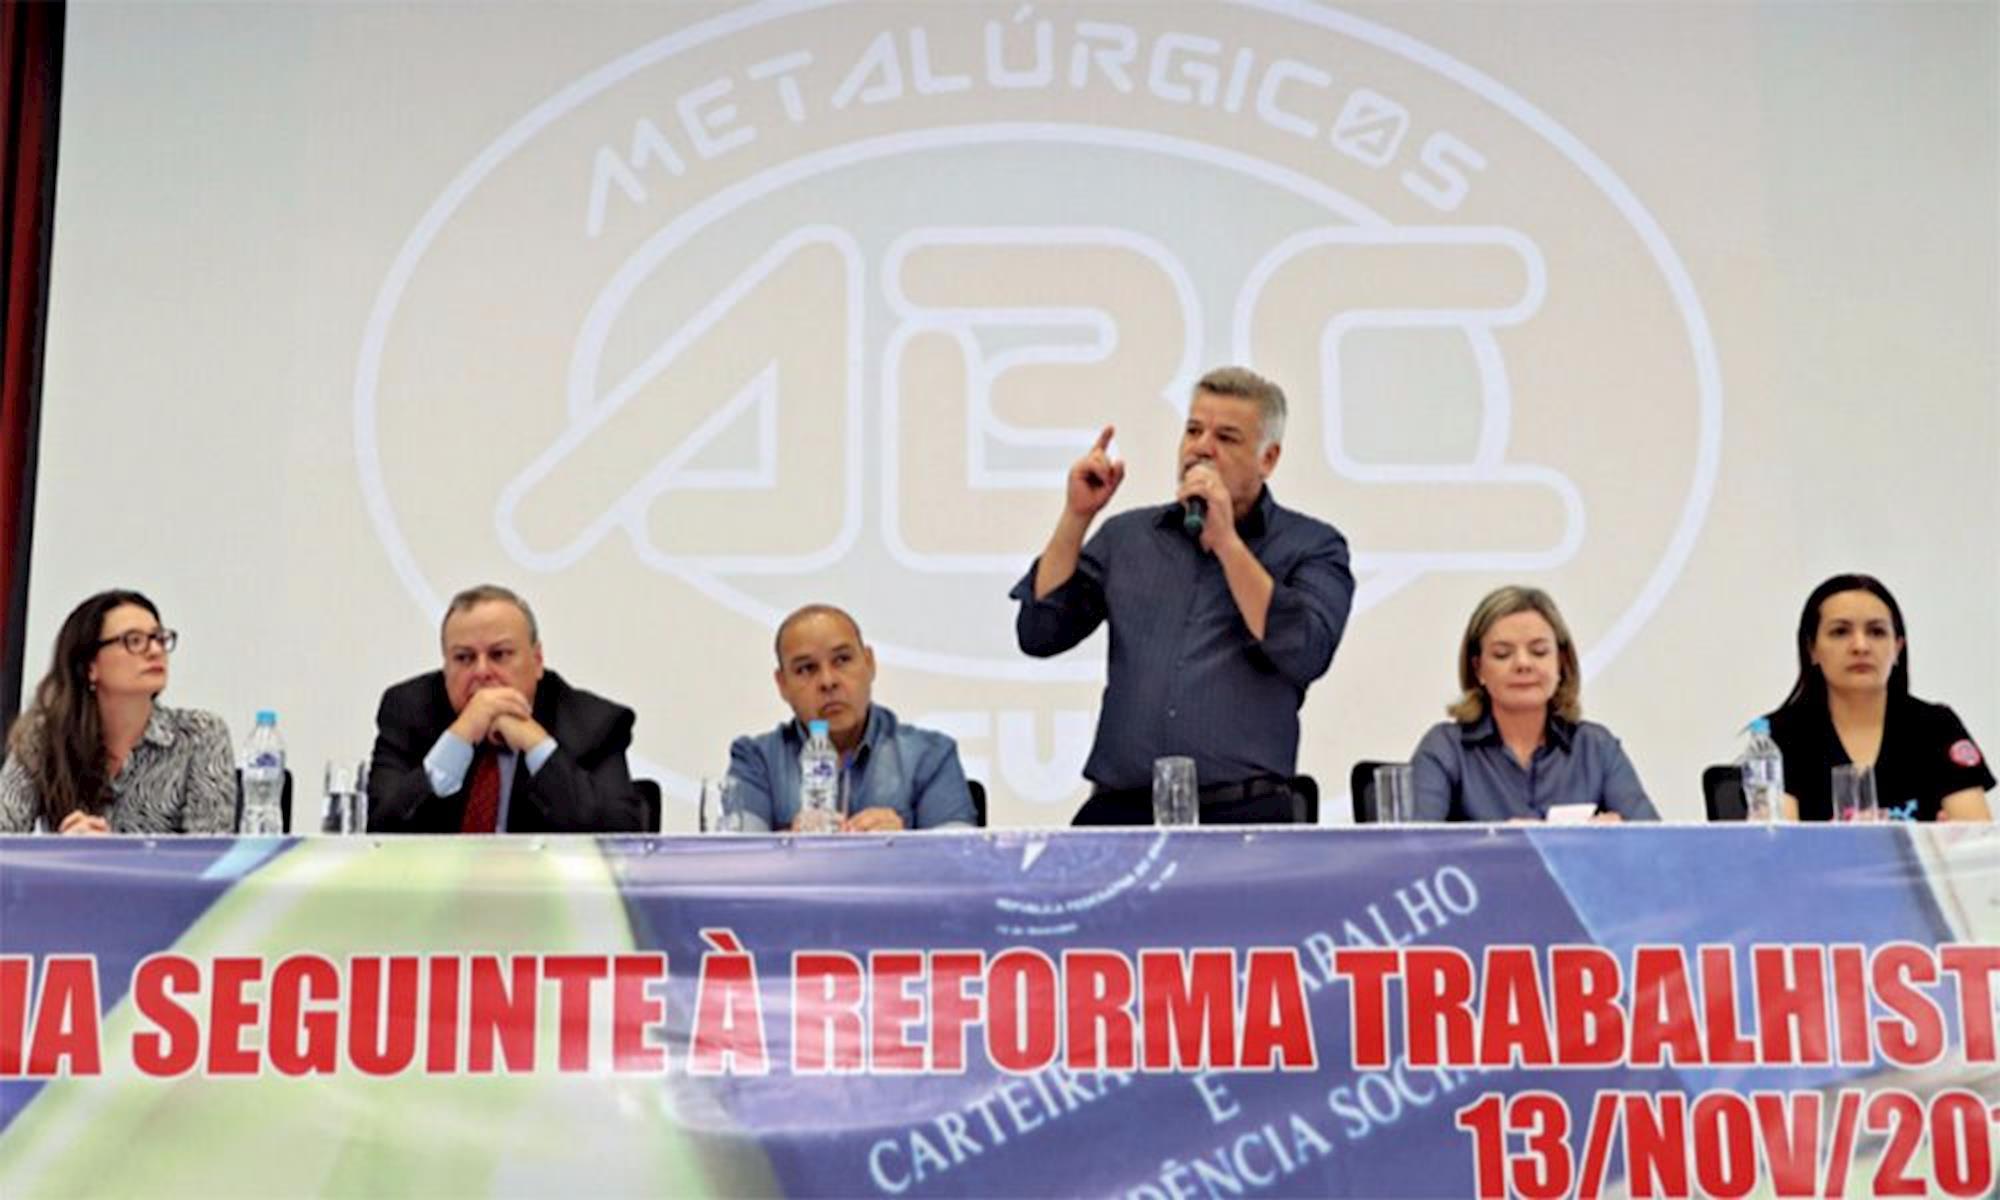 reforma, Edu Guimarães/SMABC